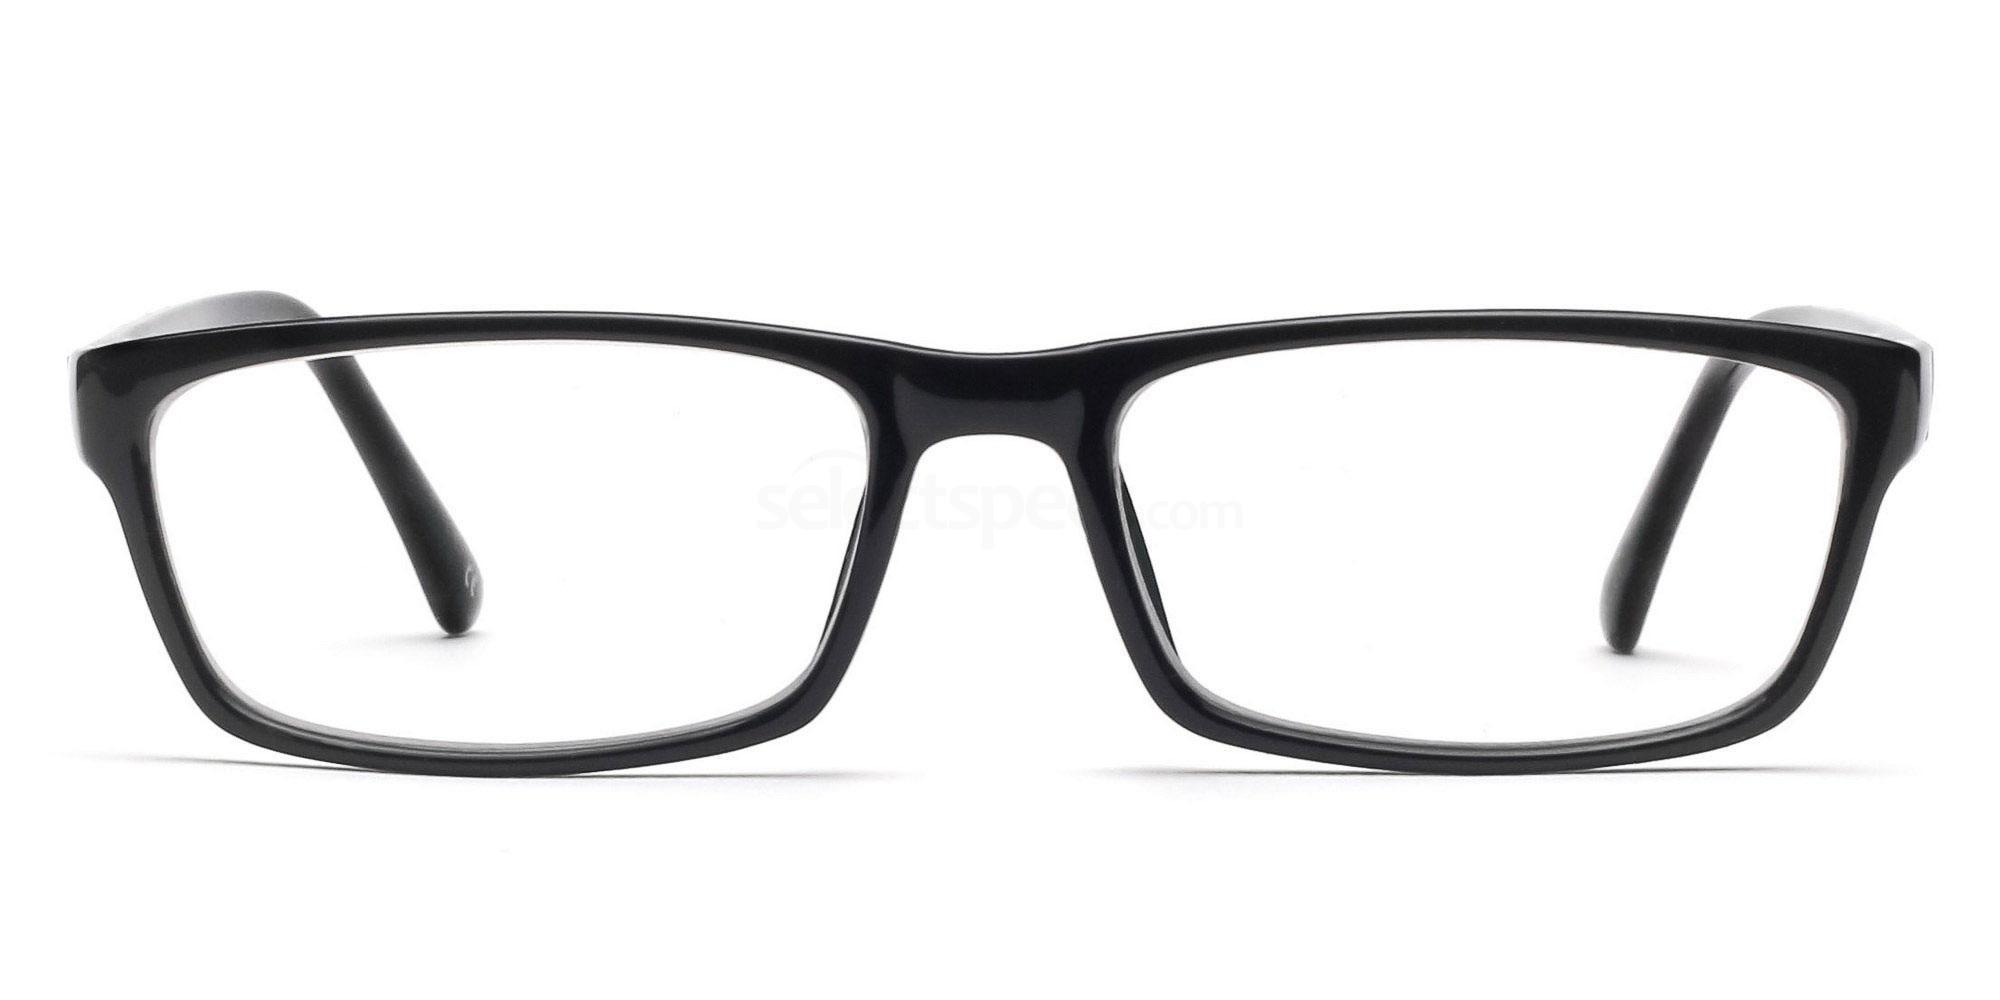 COL.01 2426 - Black Glasses, Savannah